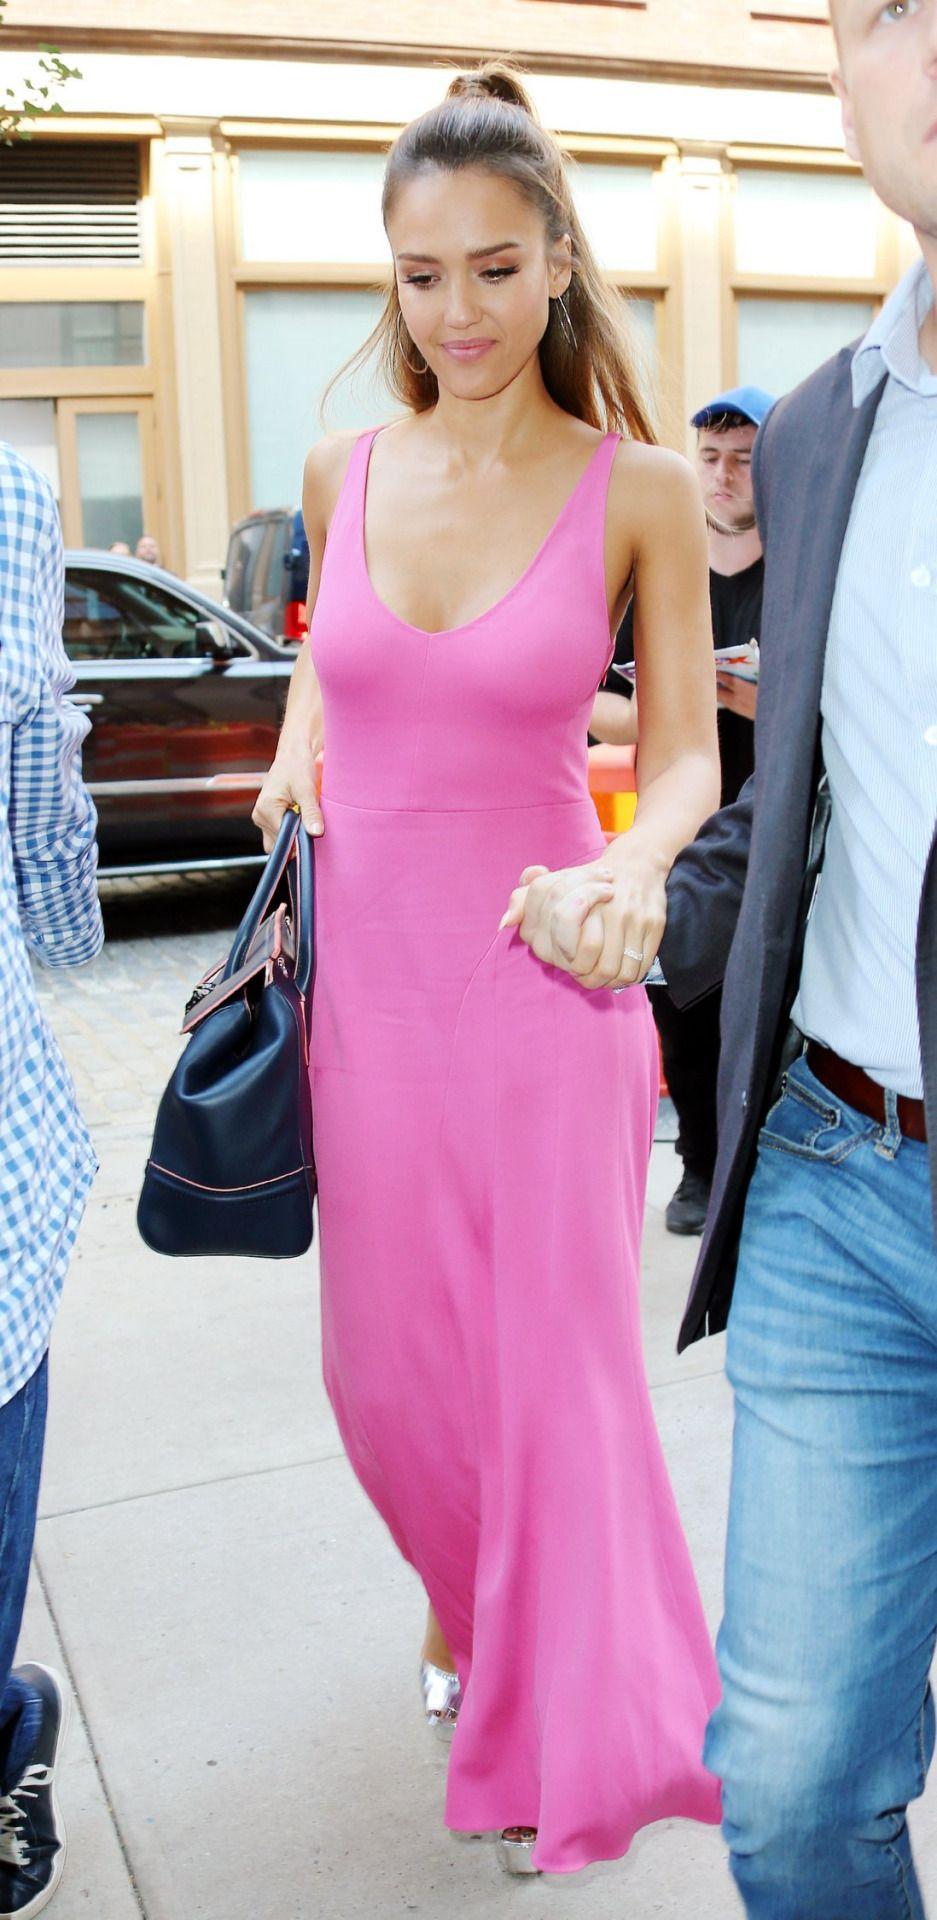 Jessica alba soon to be wardrobe d pinterest jessica alba